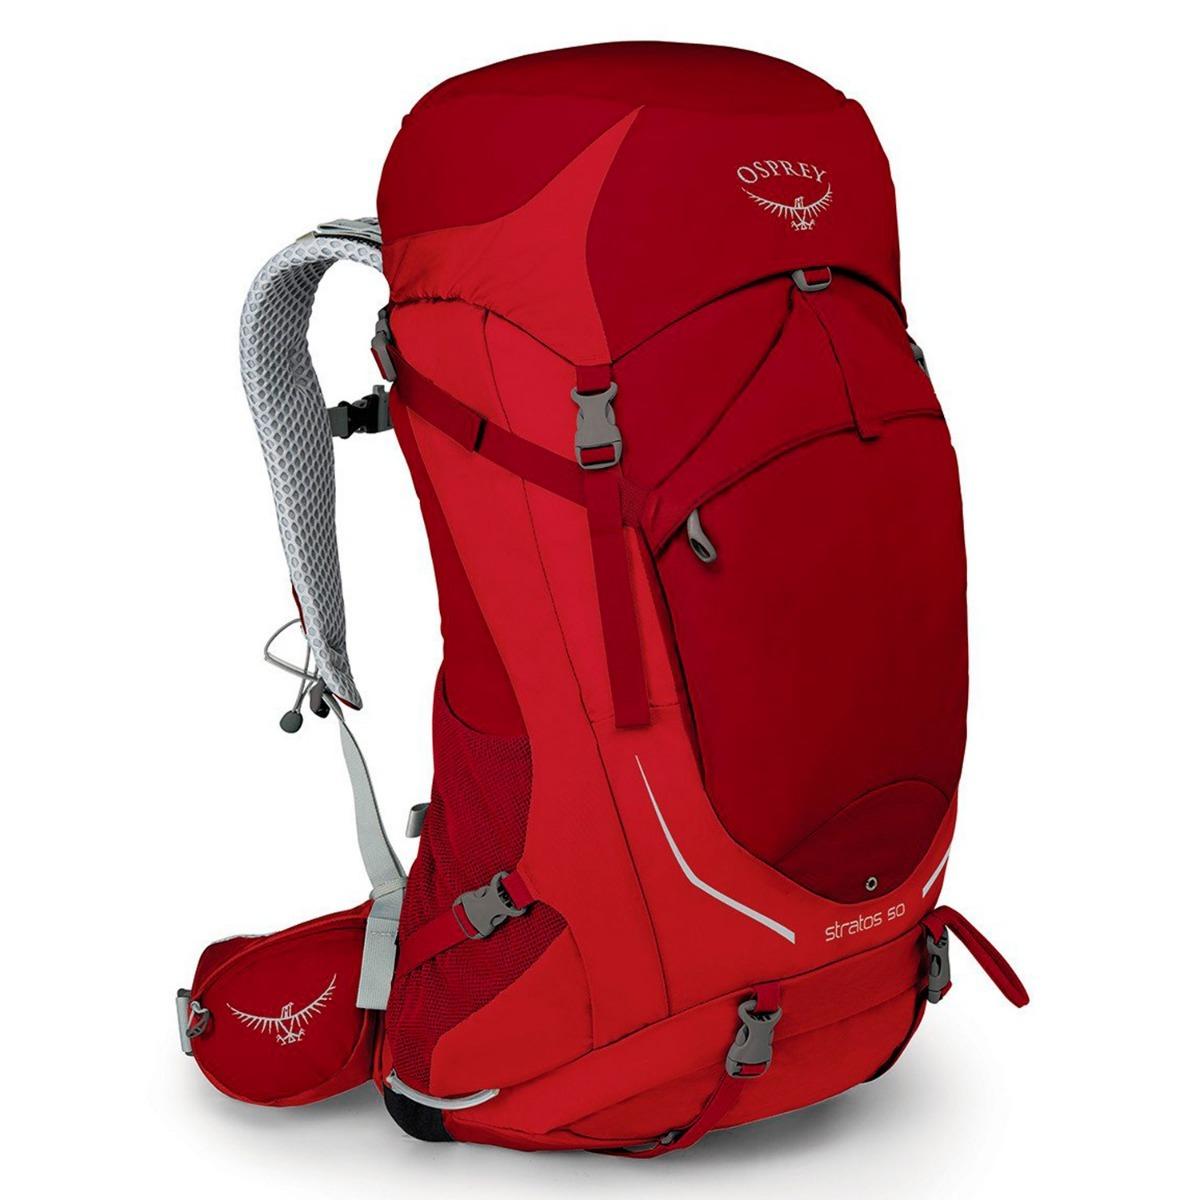 zoom stratos mochila trekking montañismo bolso Cargando viaje osprey 50 pq8BqA